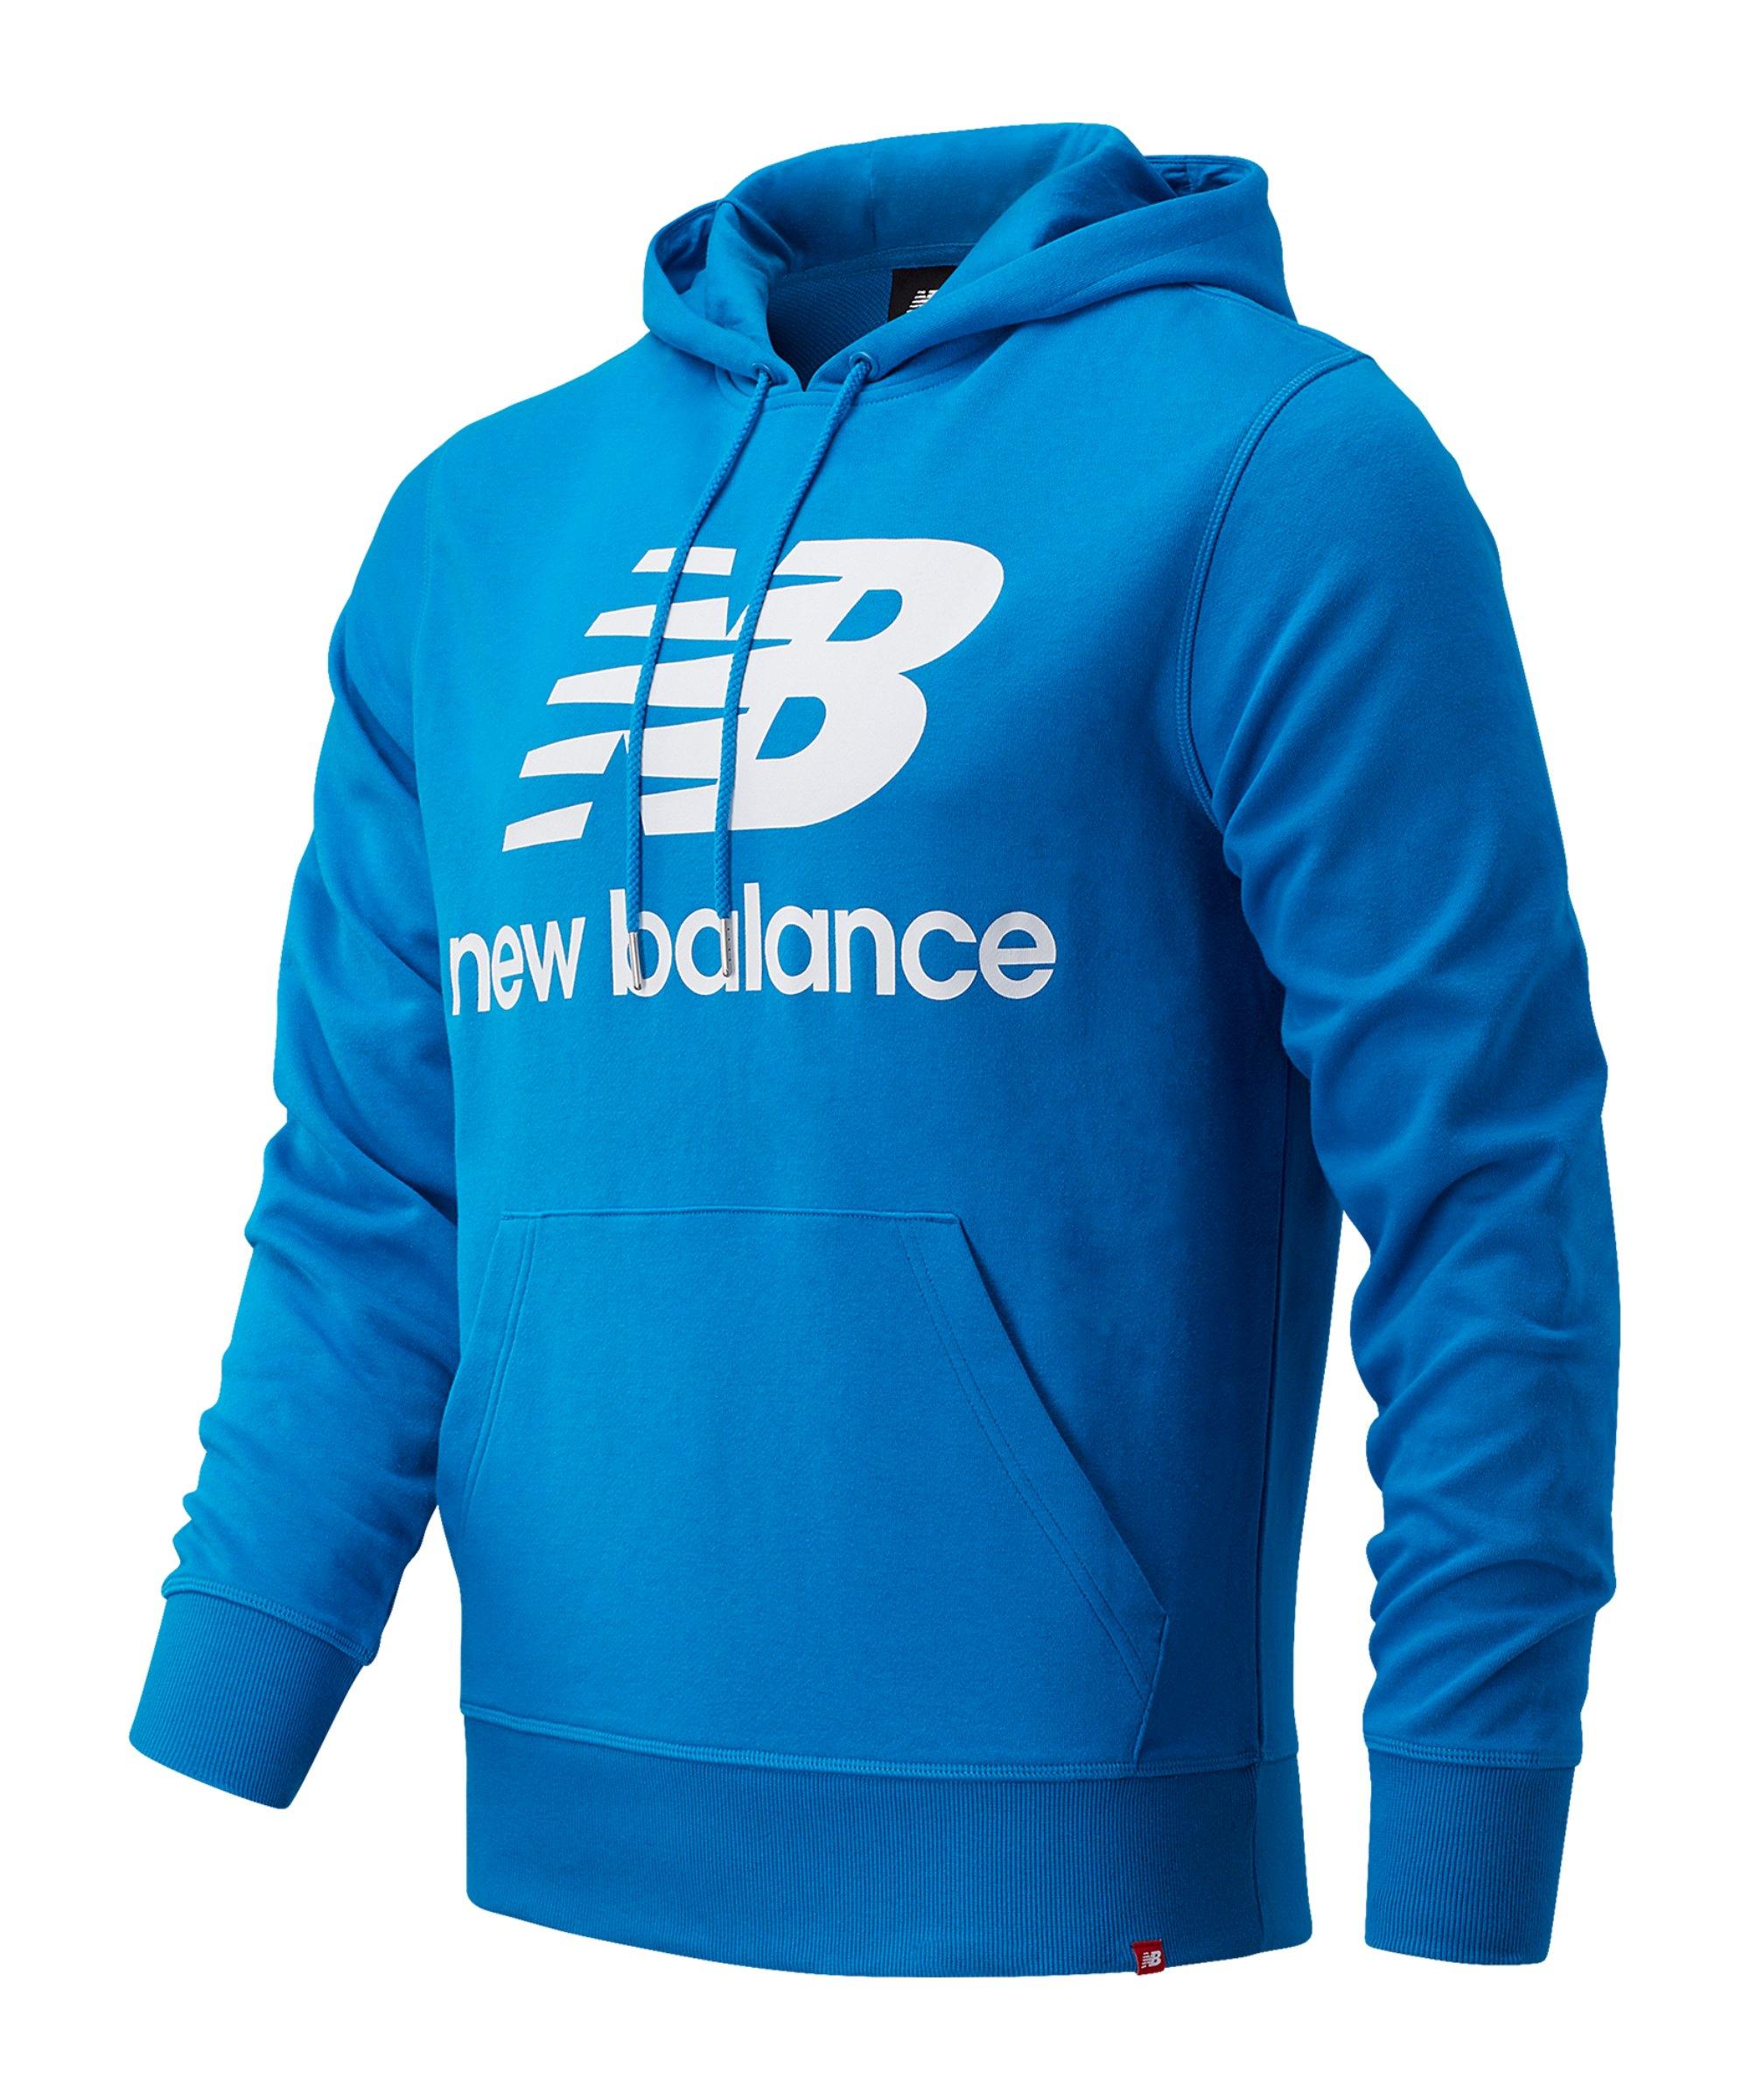 New Balance Accelerate Hose Weiss FWAB - blau